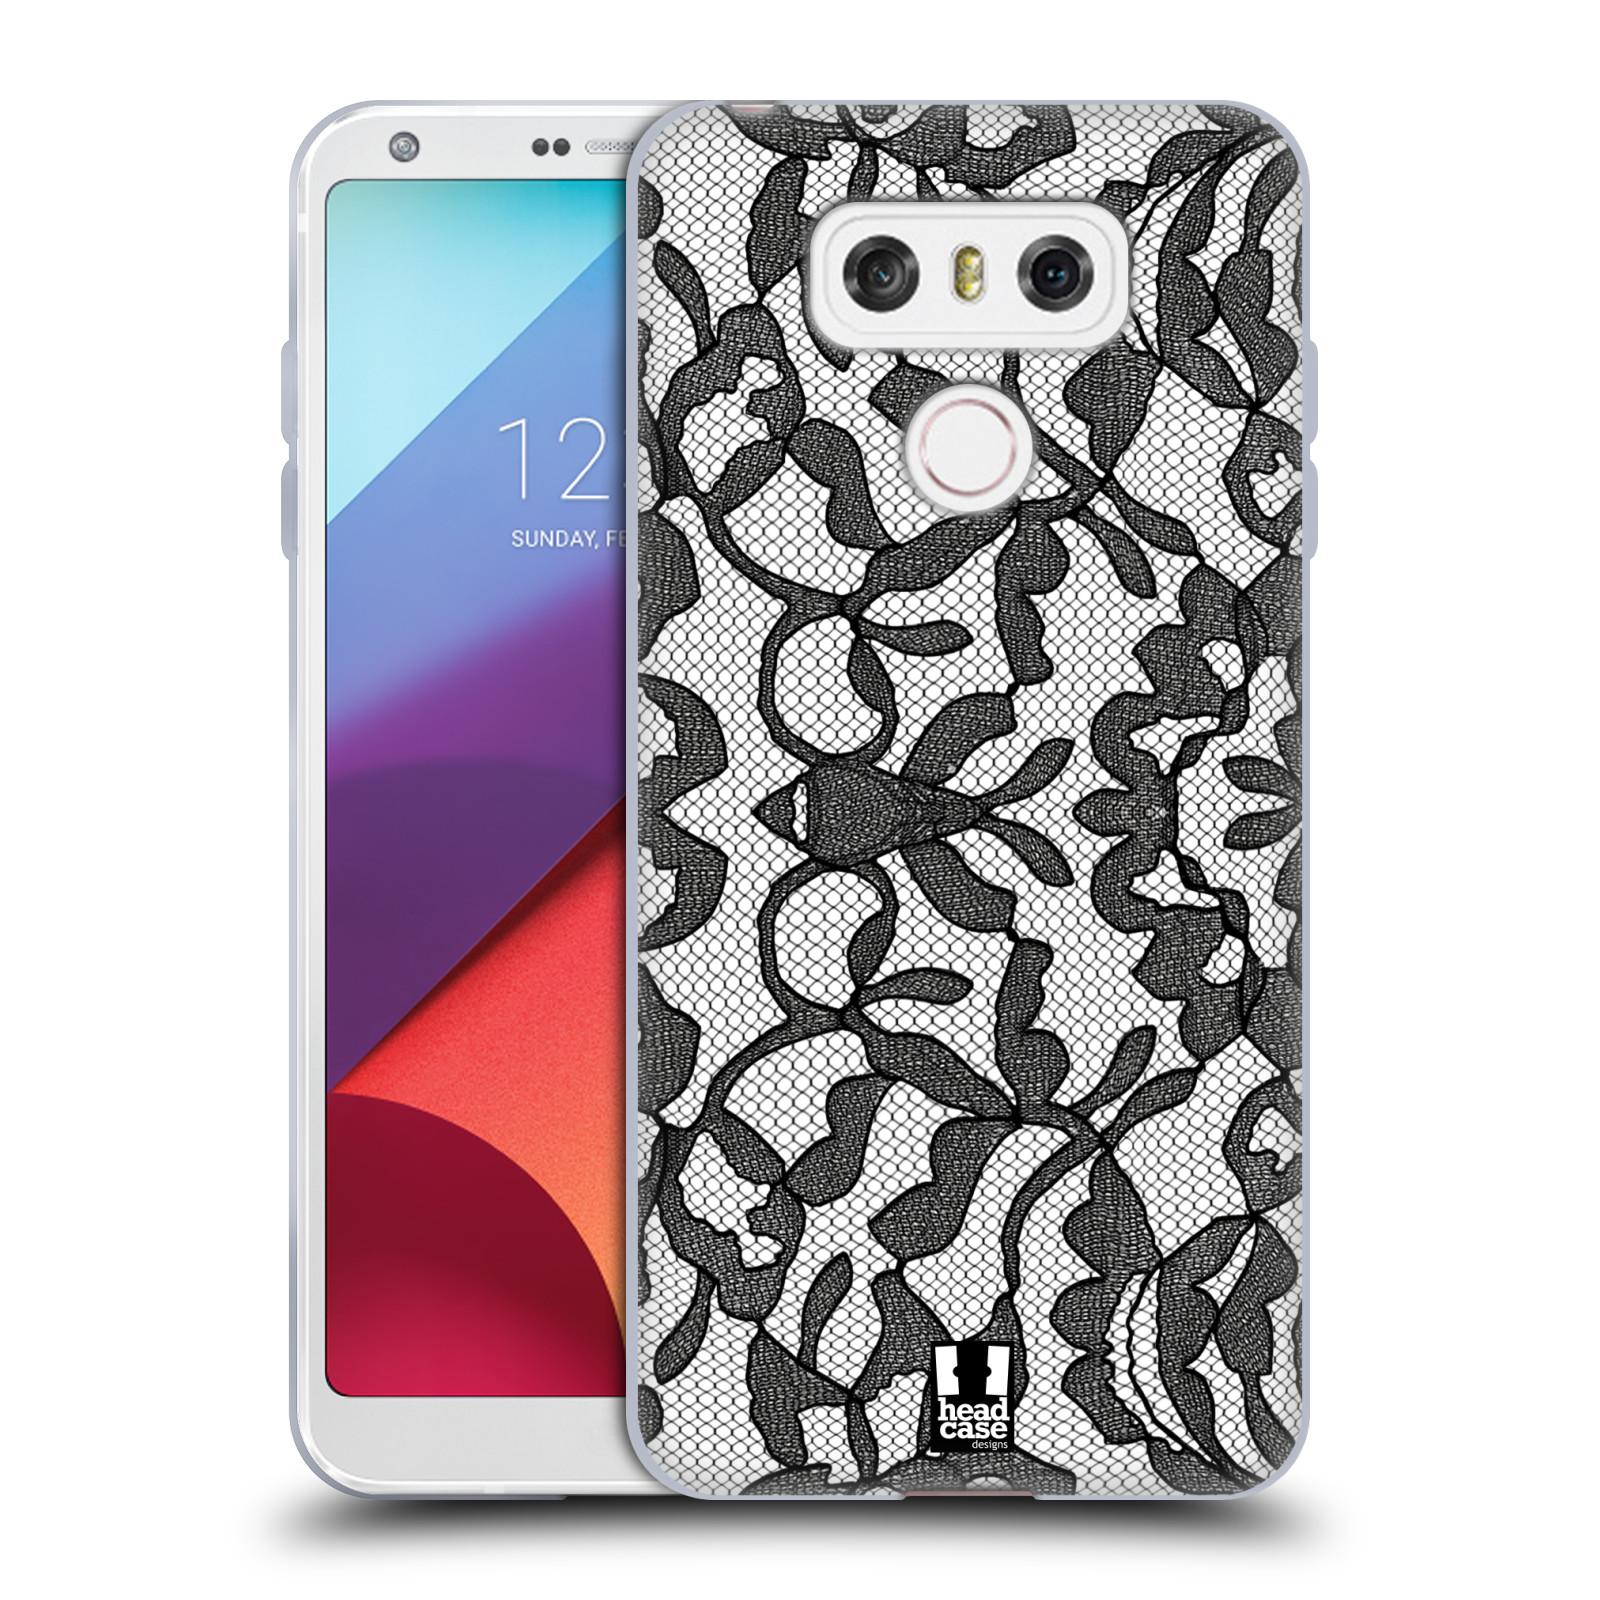 Silikonové pouzdro na mobil LG G6 - Head Case LEAFY KRAJKA